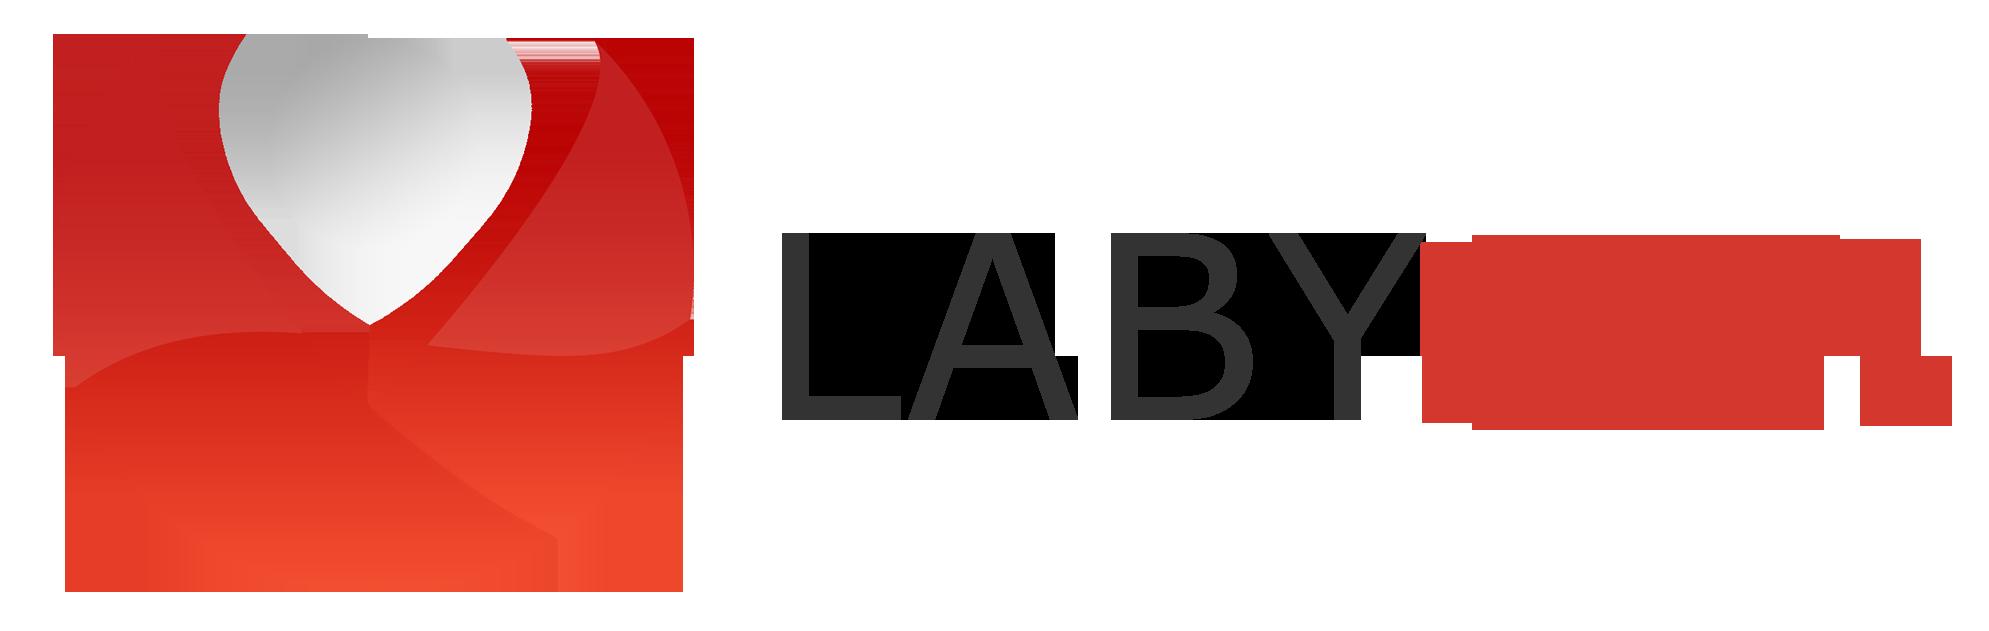 labycar